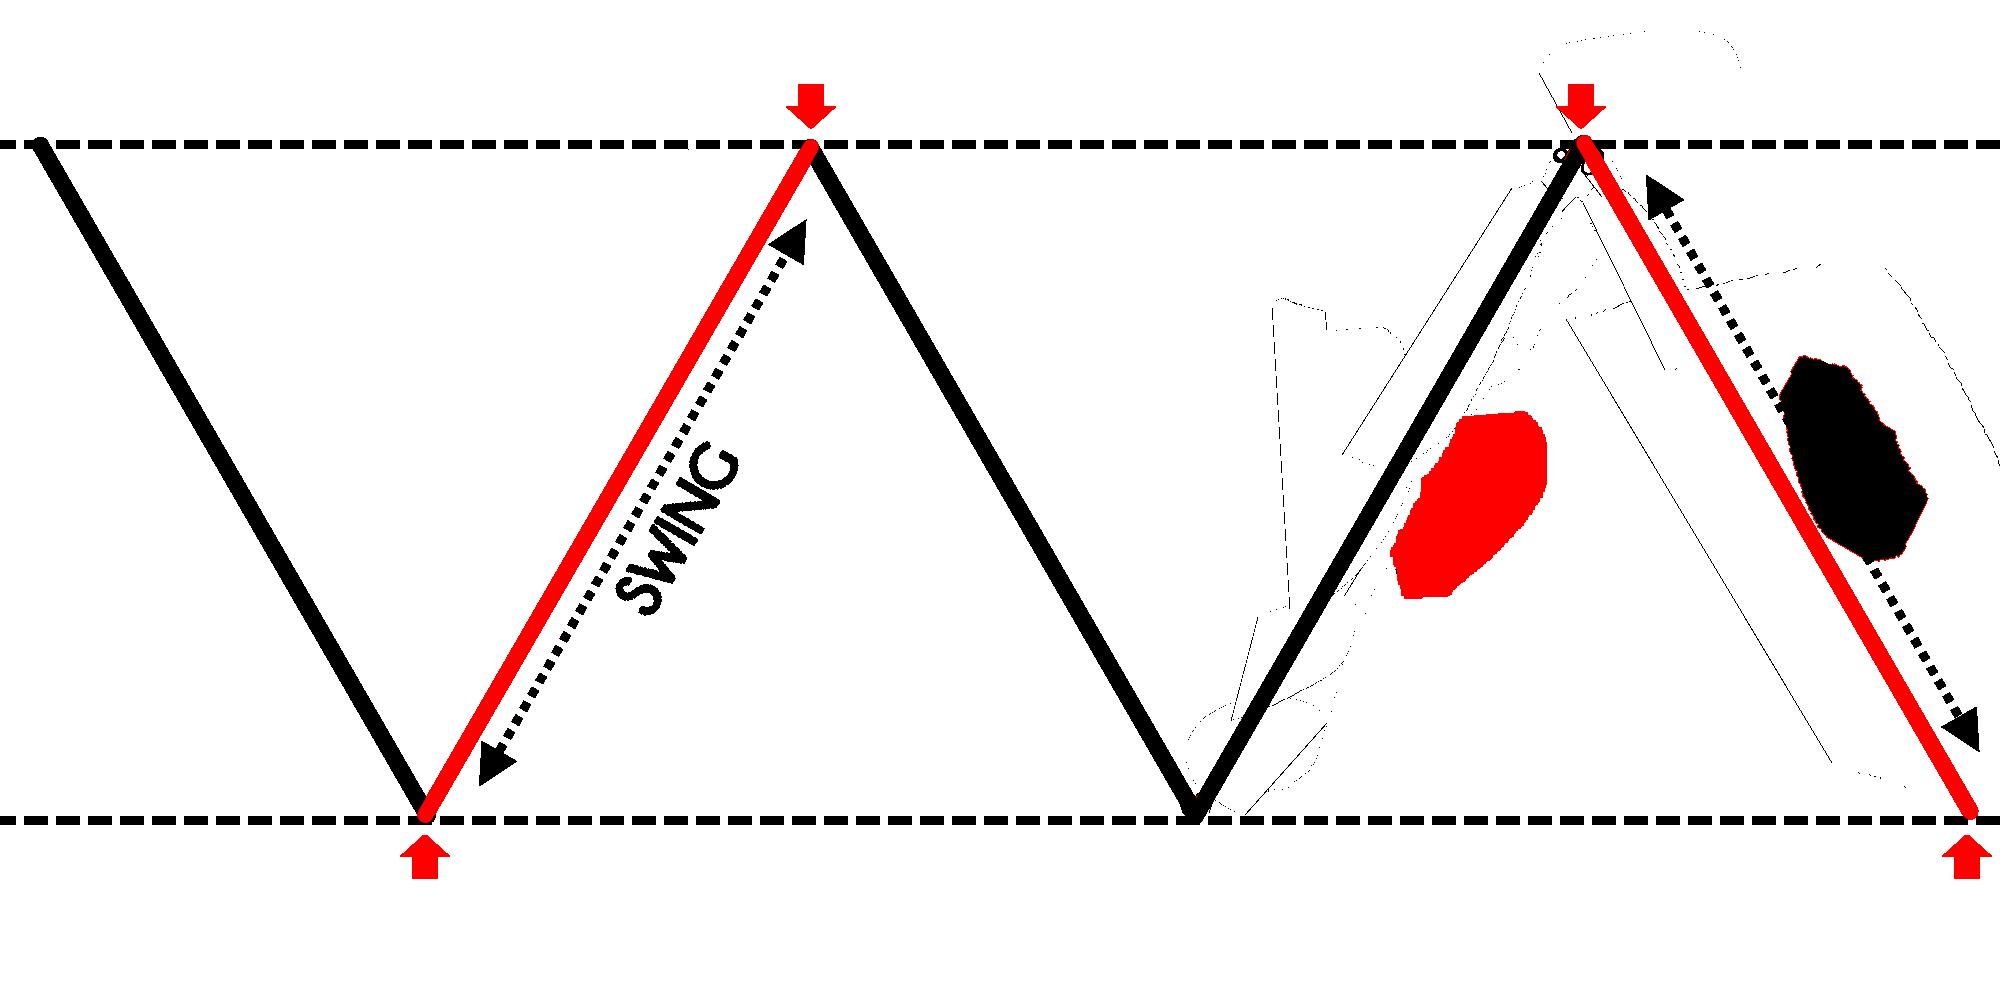 RSI Indicator,Relative Strength Index